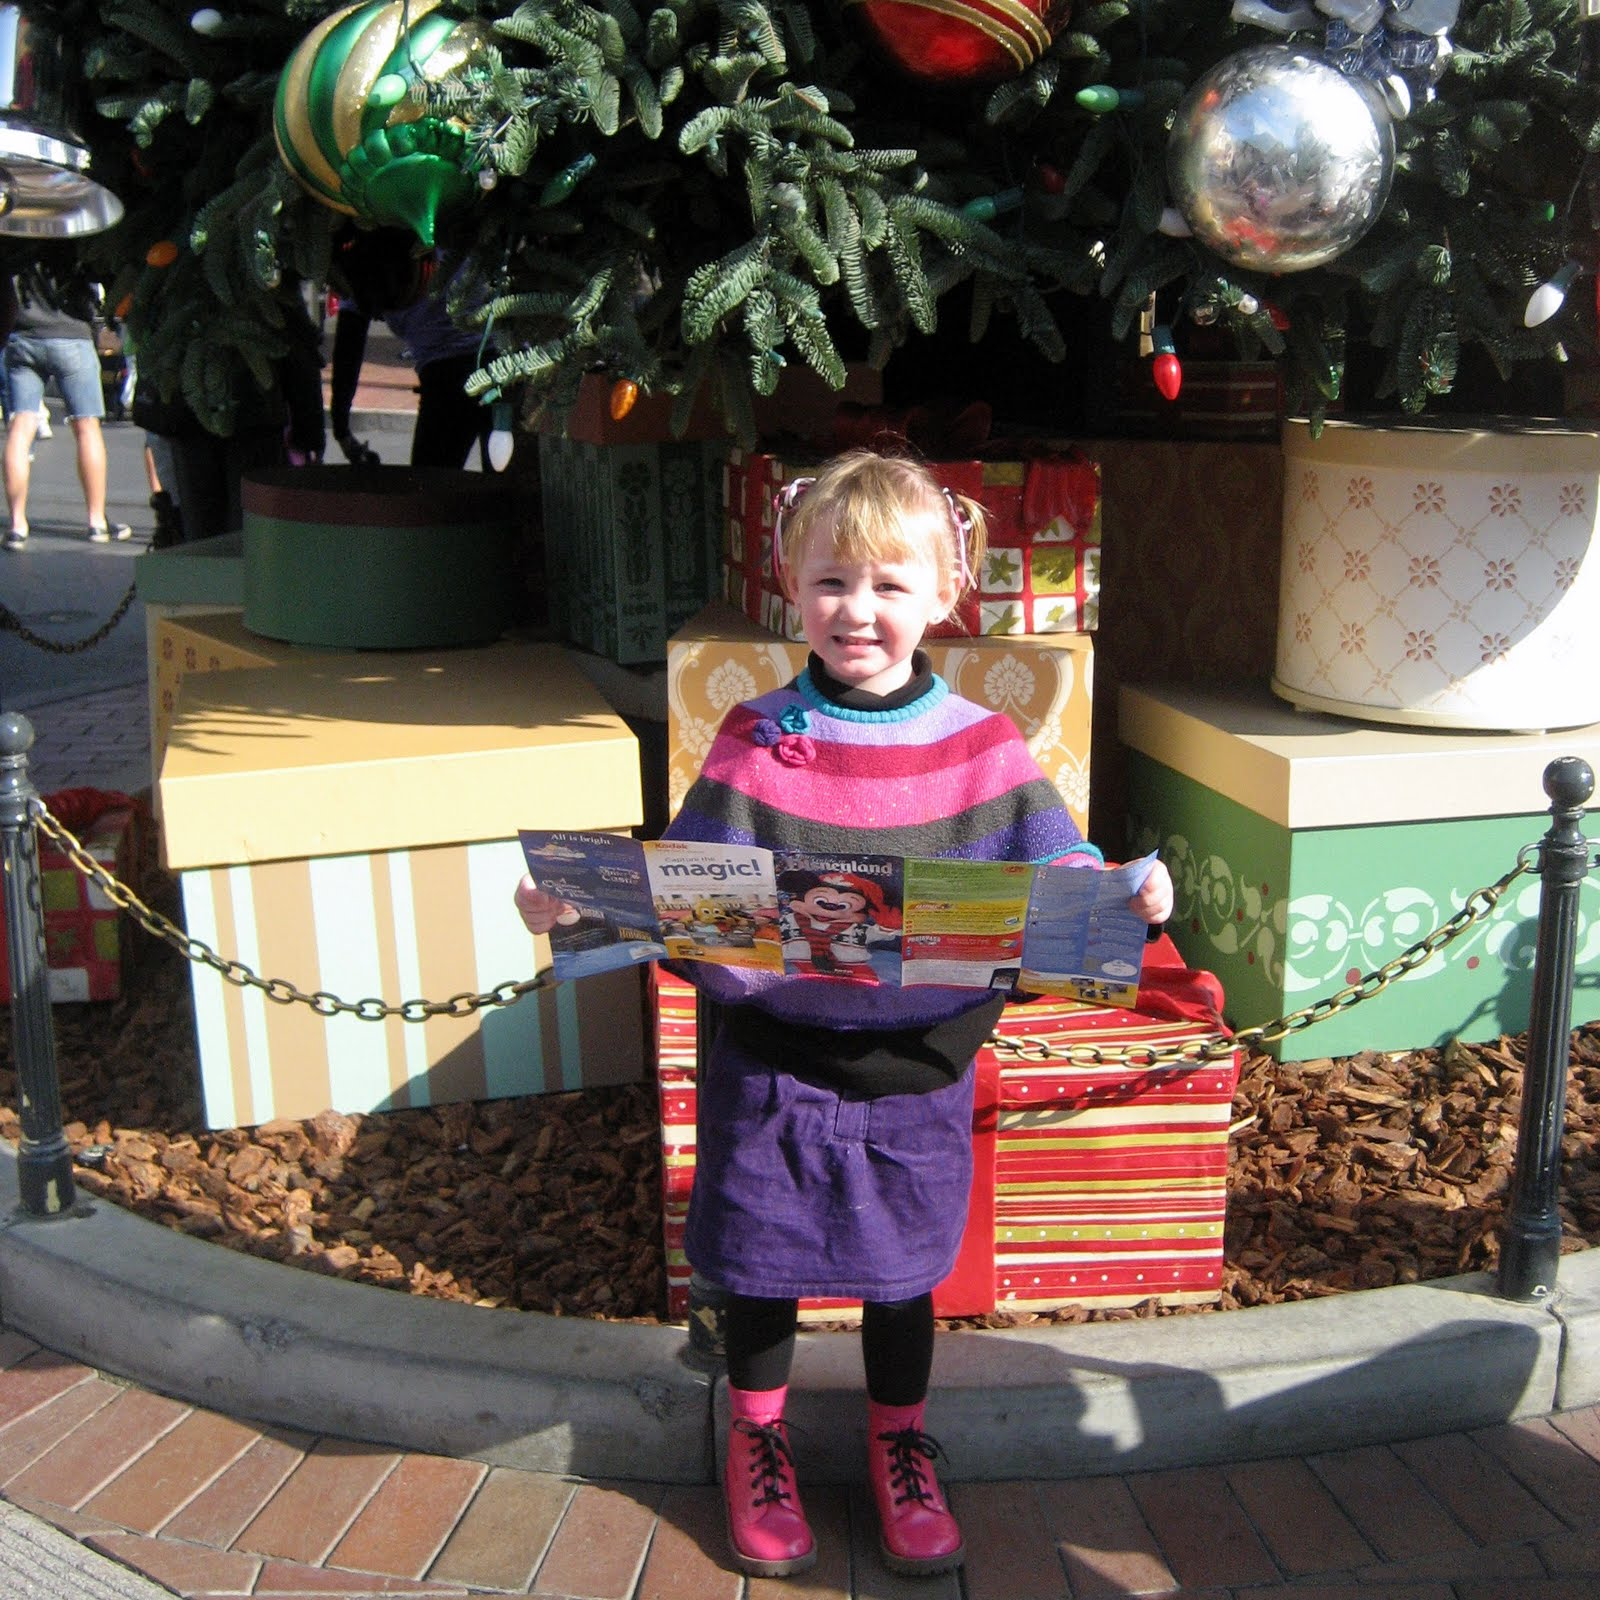 Ariel's Grotto Princess Celebration